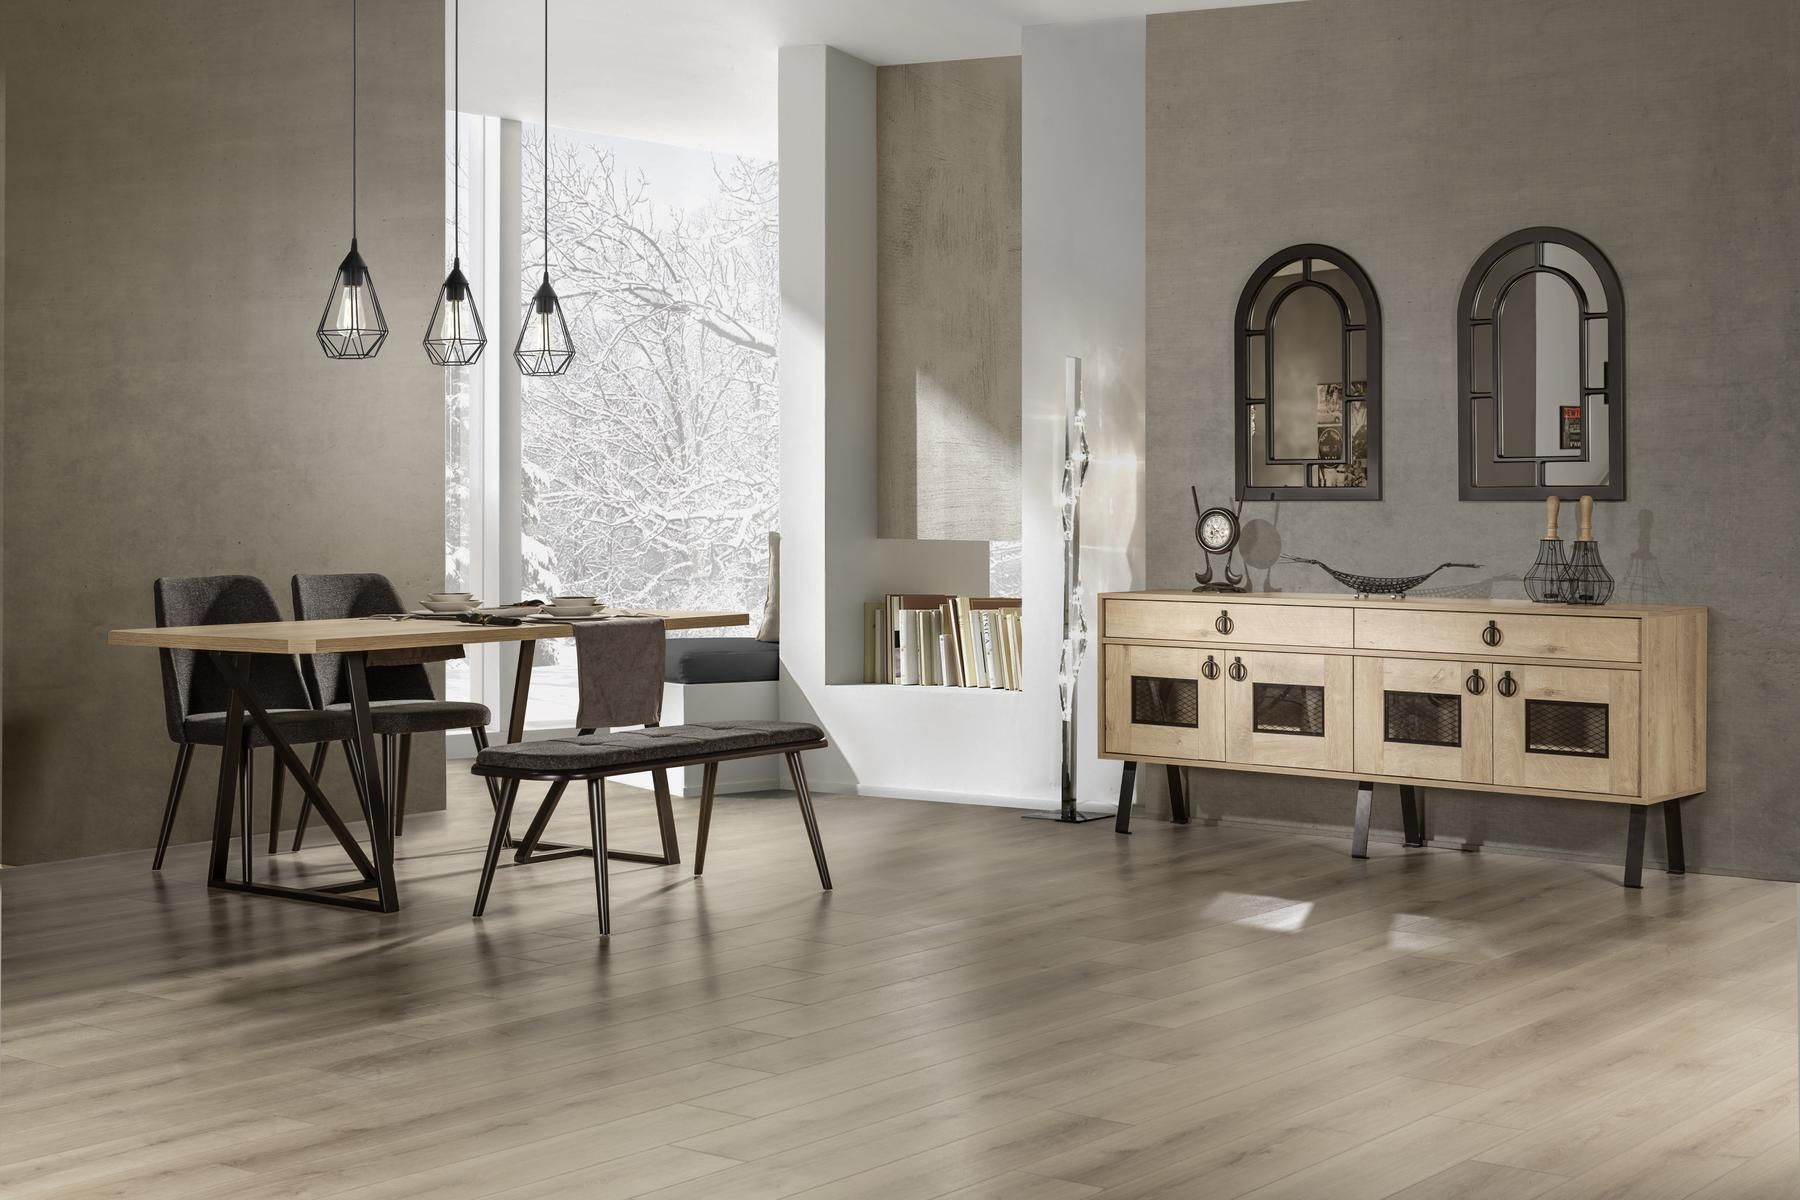 Yemek Odasi Takimlari Home Decor Sofa Design Turkish Furniture